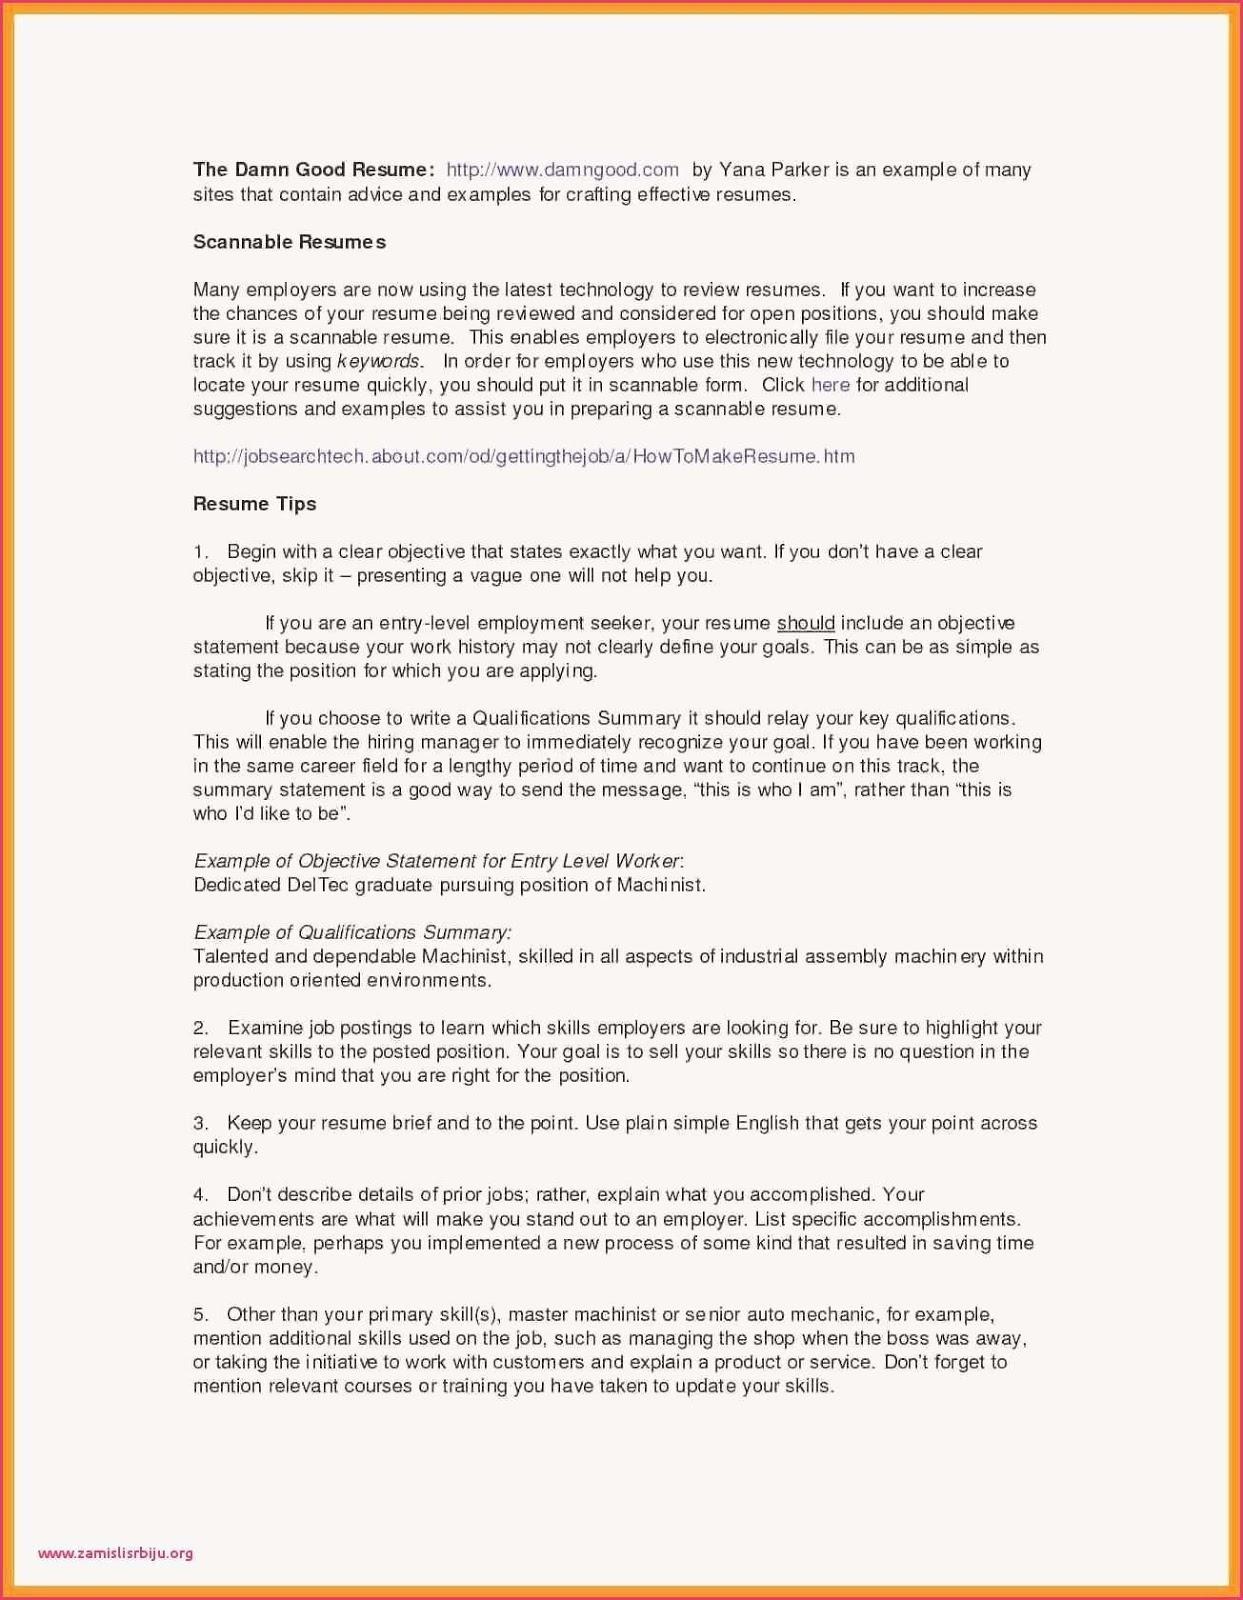 general job resume objective 2019 general job resume format general job resume summary 2020 general job resume objective examples general job resume sample general manager resume job description general manager job resume